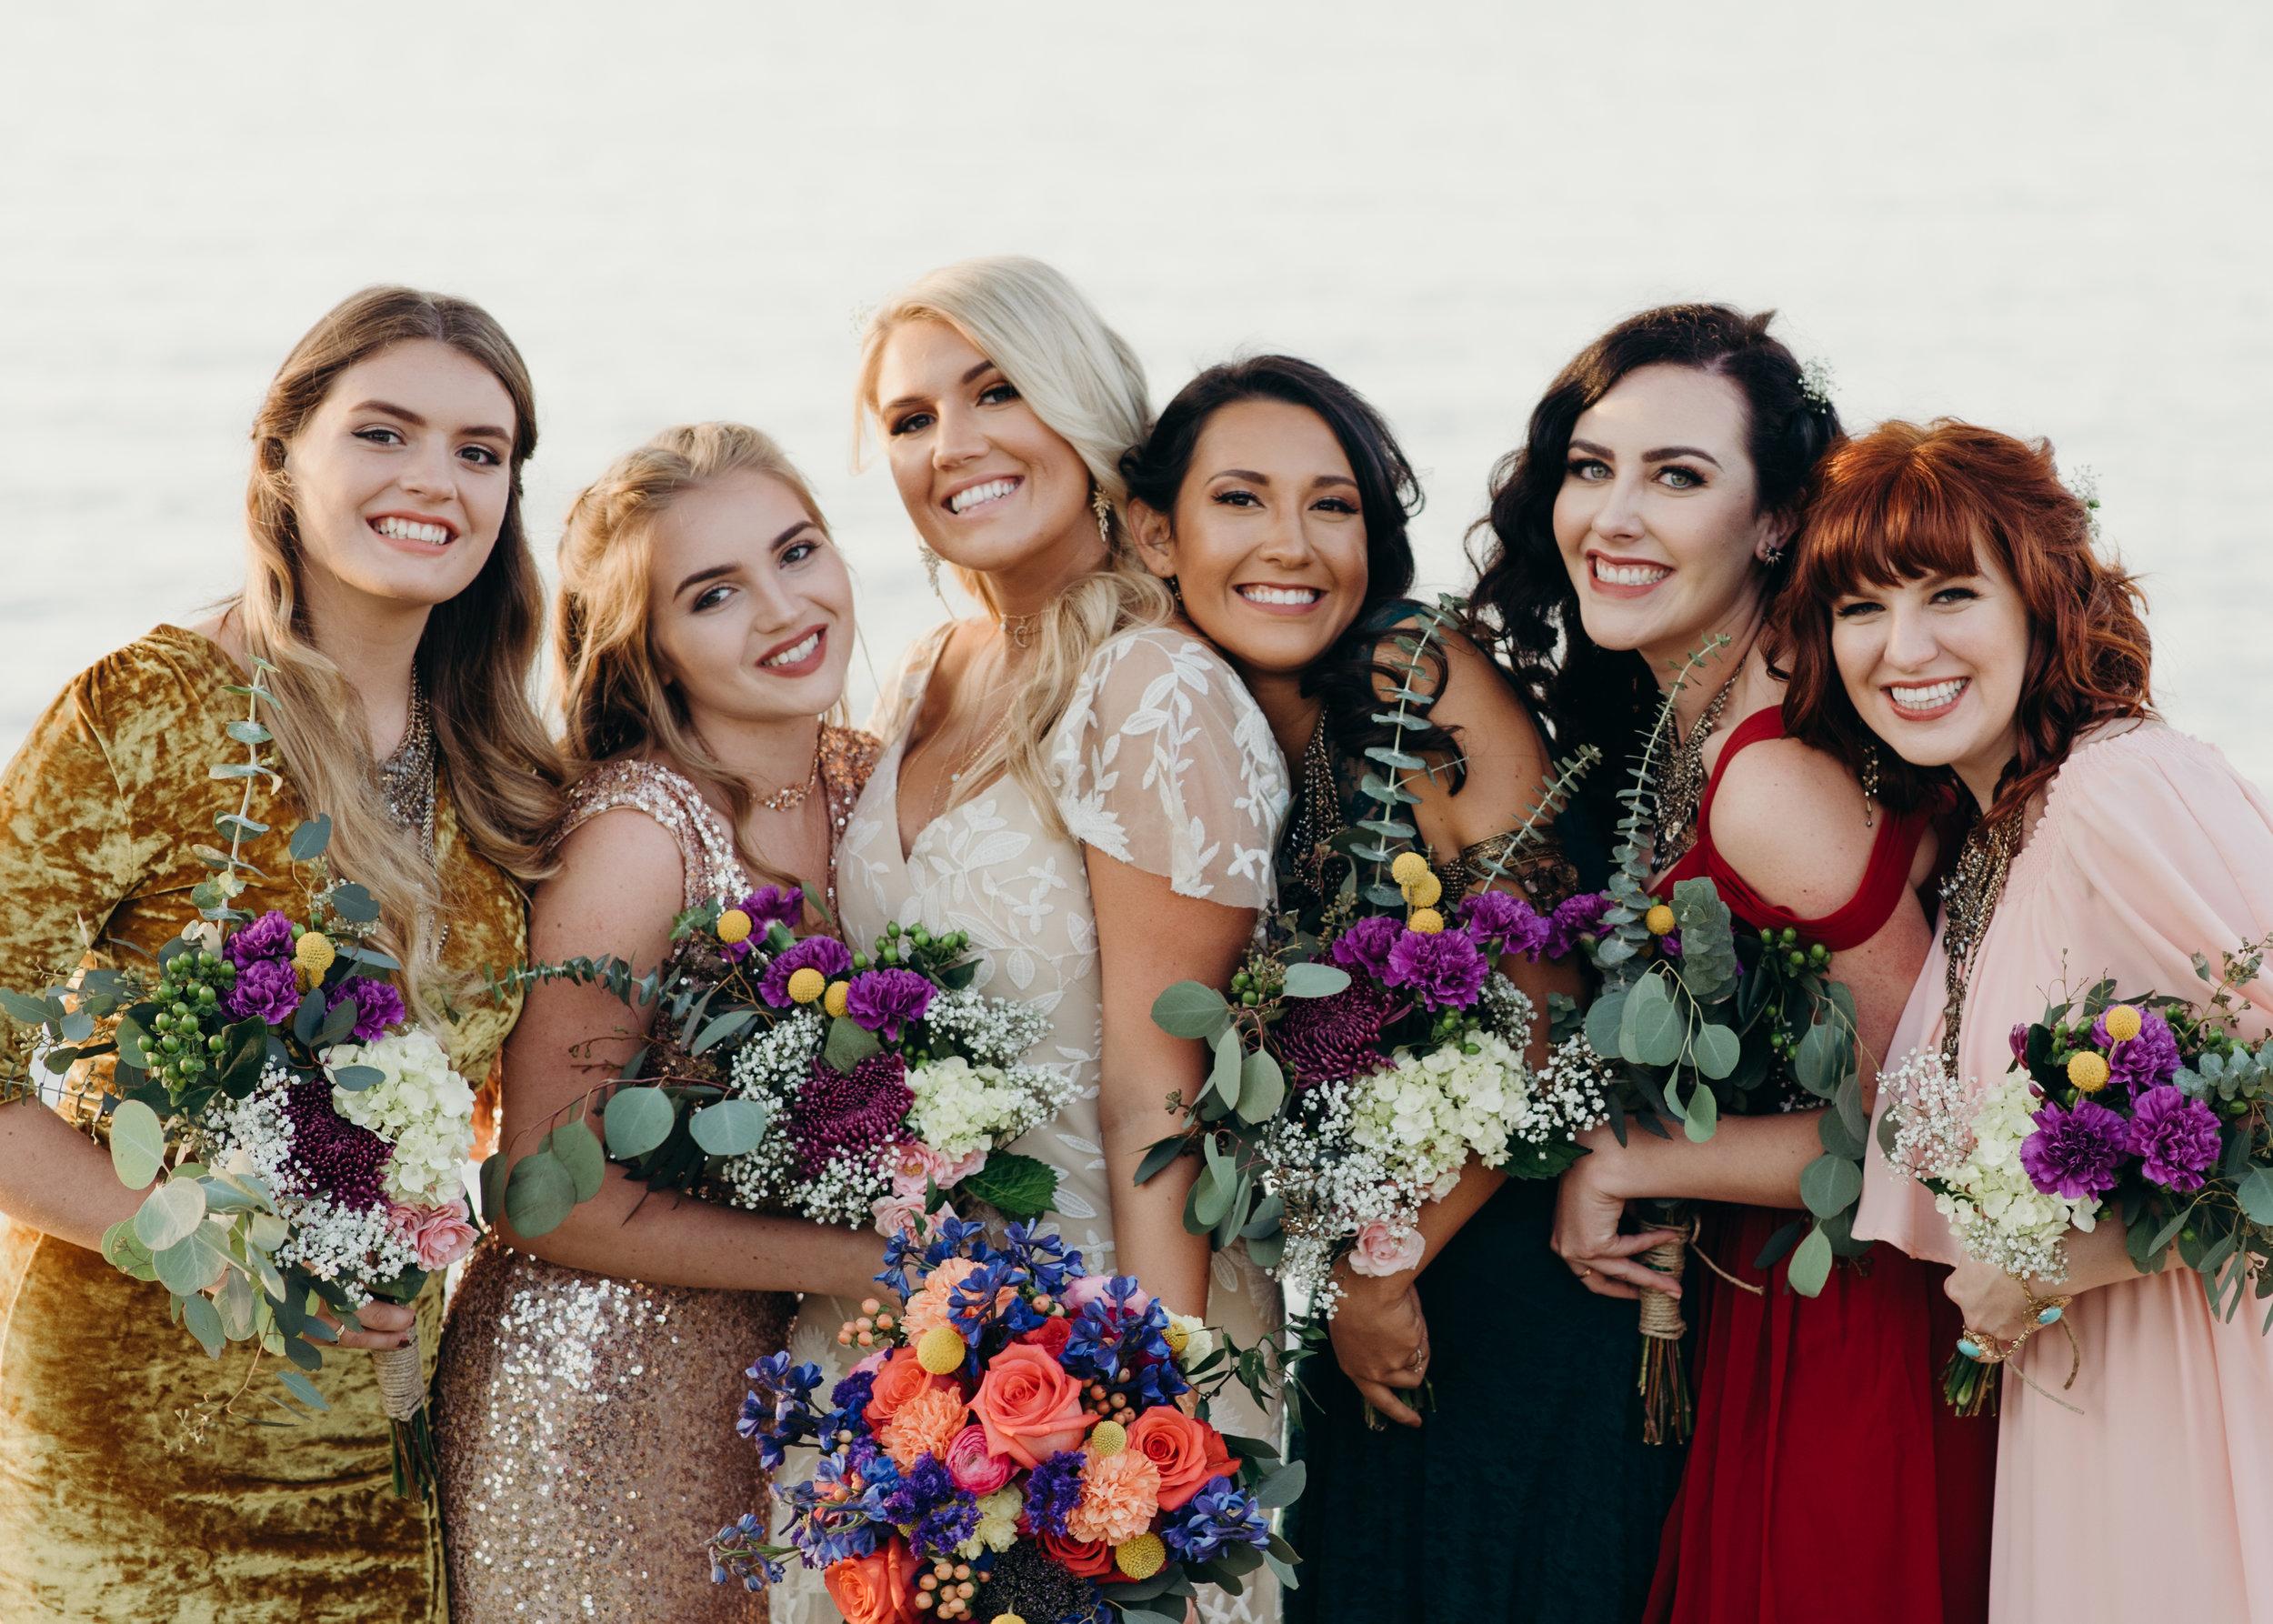 zayda-collin-panama-city-wedding-photography-trippy-bohemian-lisa-frank-wedding-group-shots-12.jpg